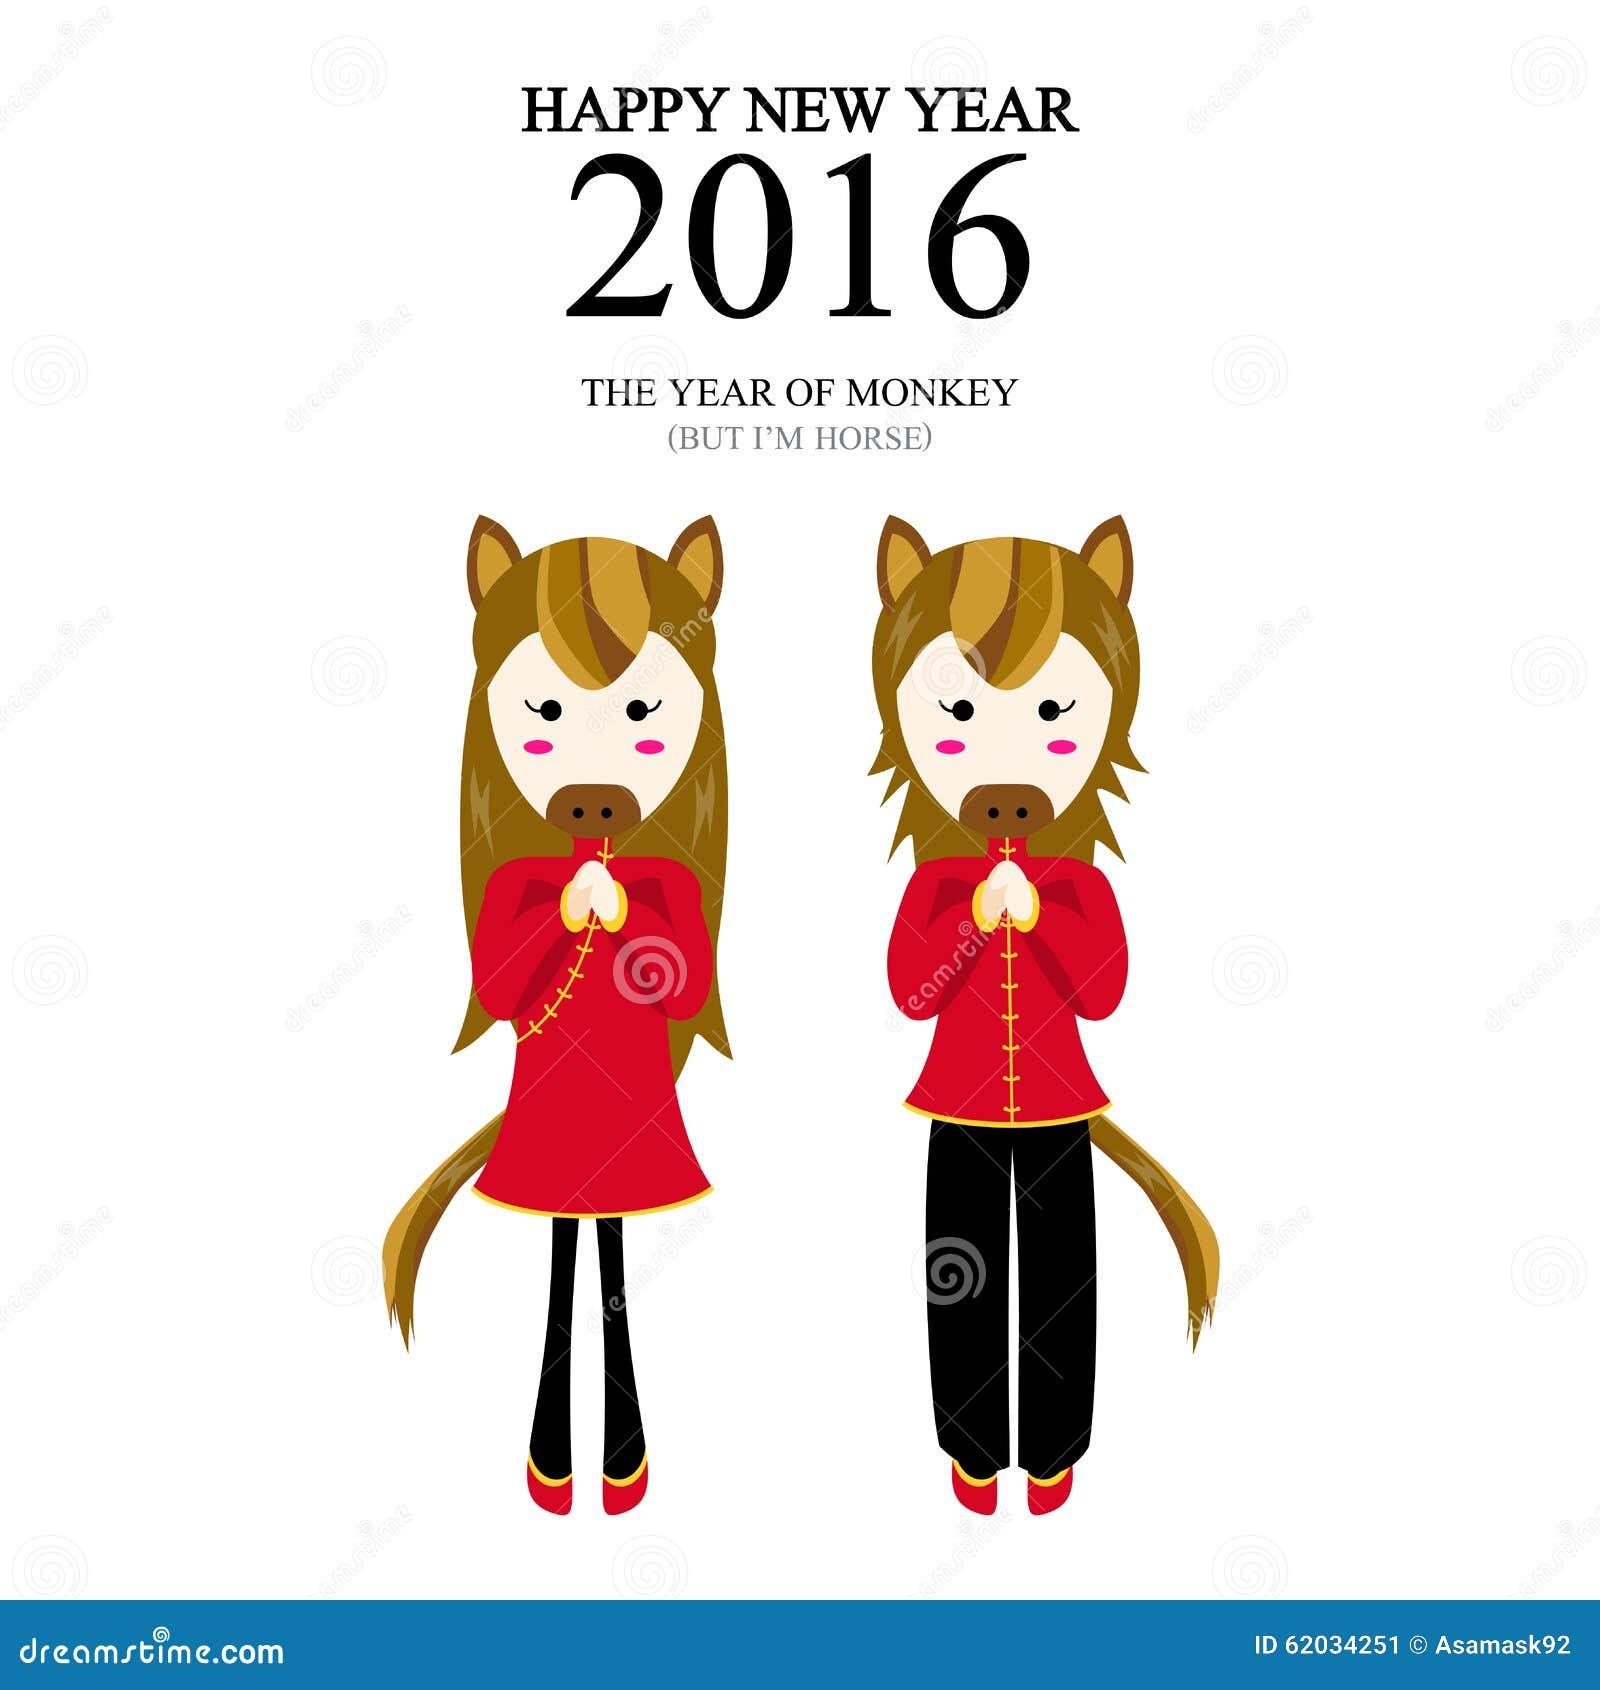 ... year of monkey but i'm horse design for Chinese New Year celebration